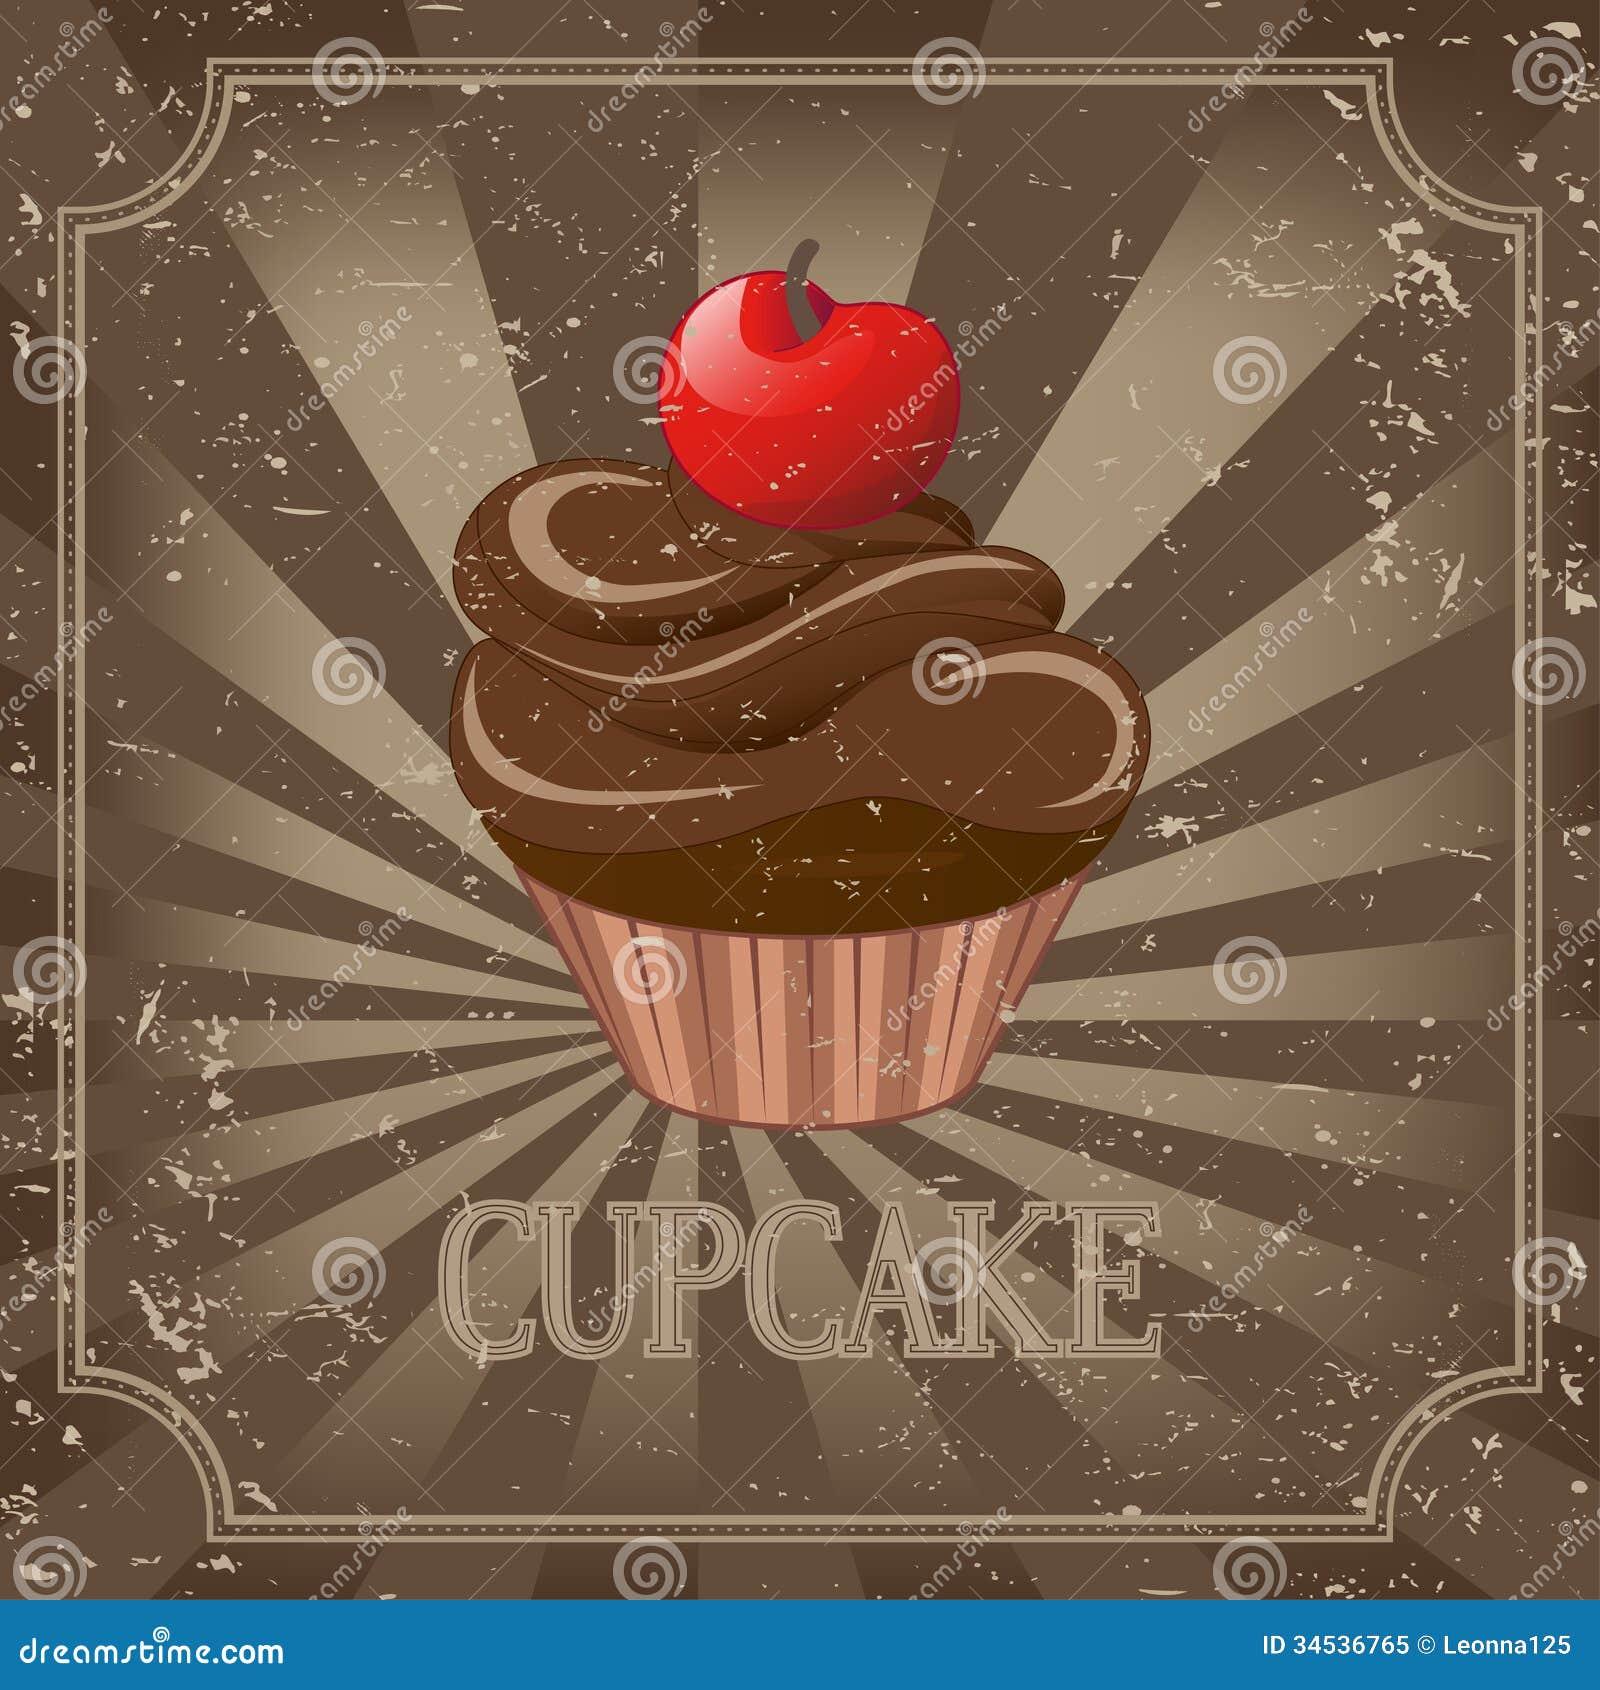 Retro Beach Illustration Royalty Free Stock Photo: Cupcake On Vintage Background